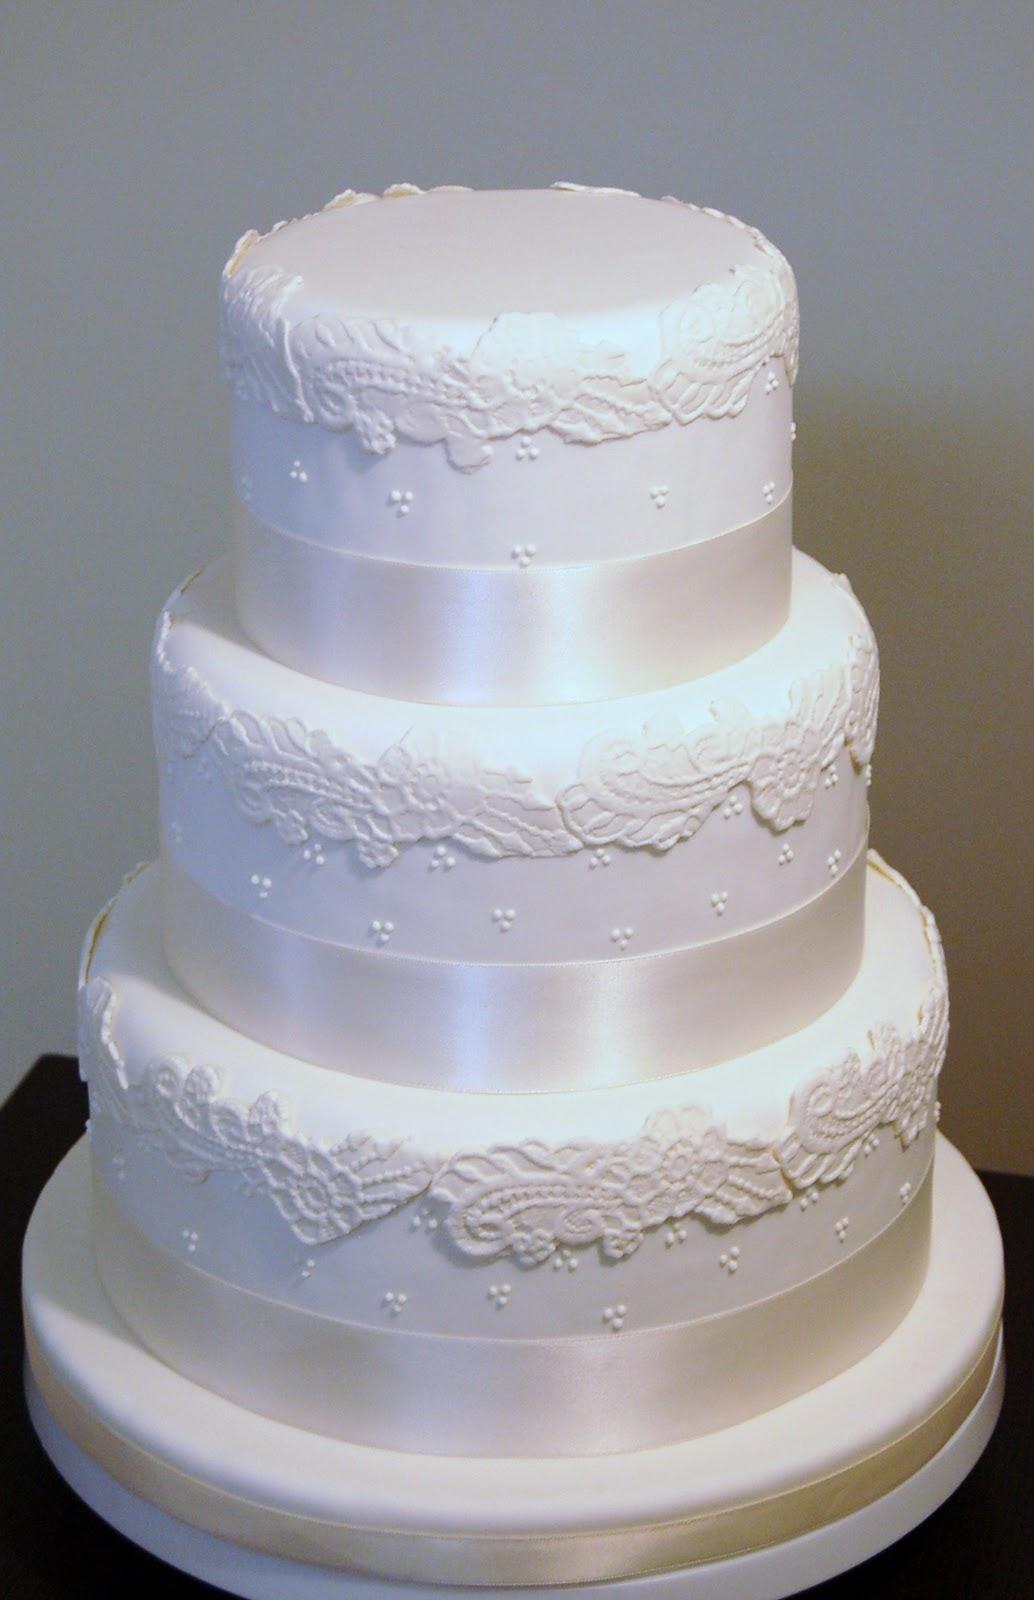 Cake Lace Watermark